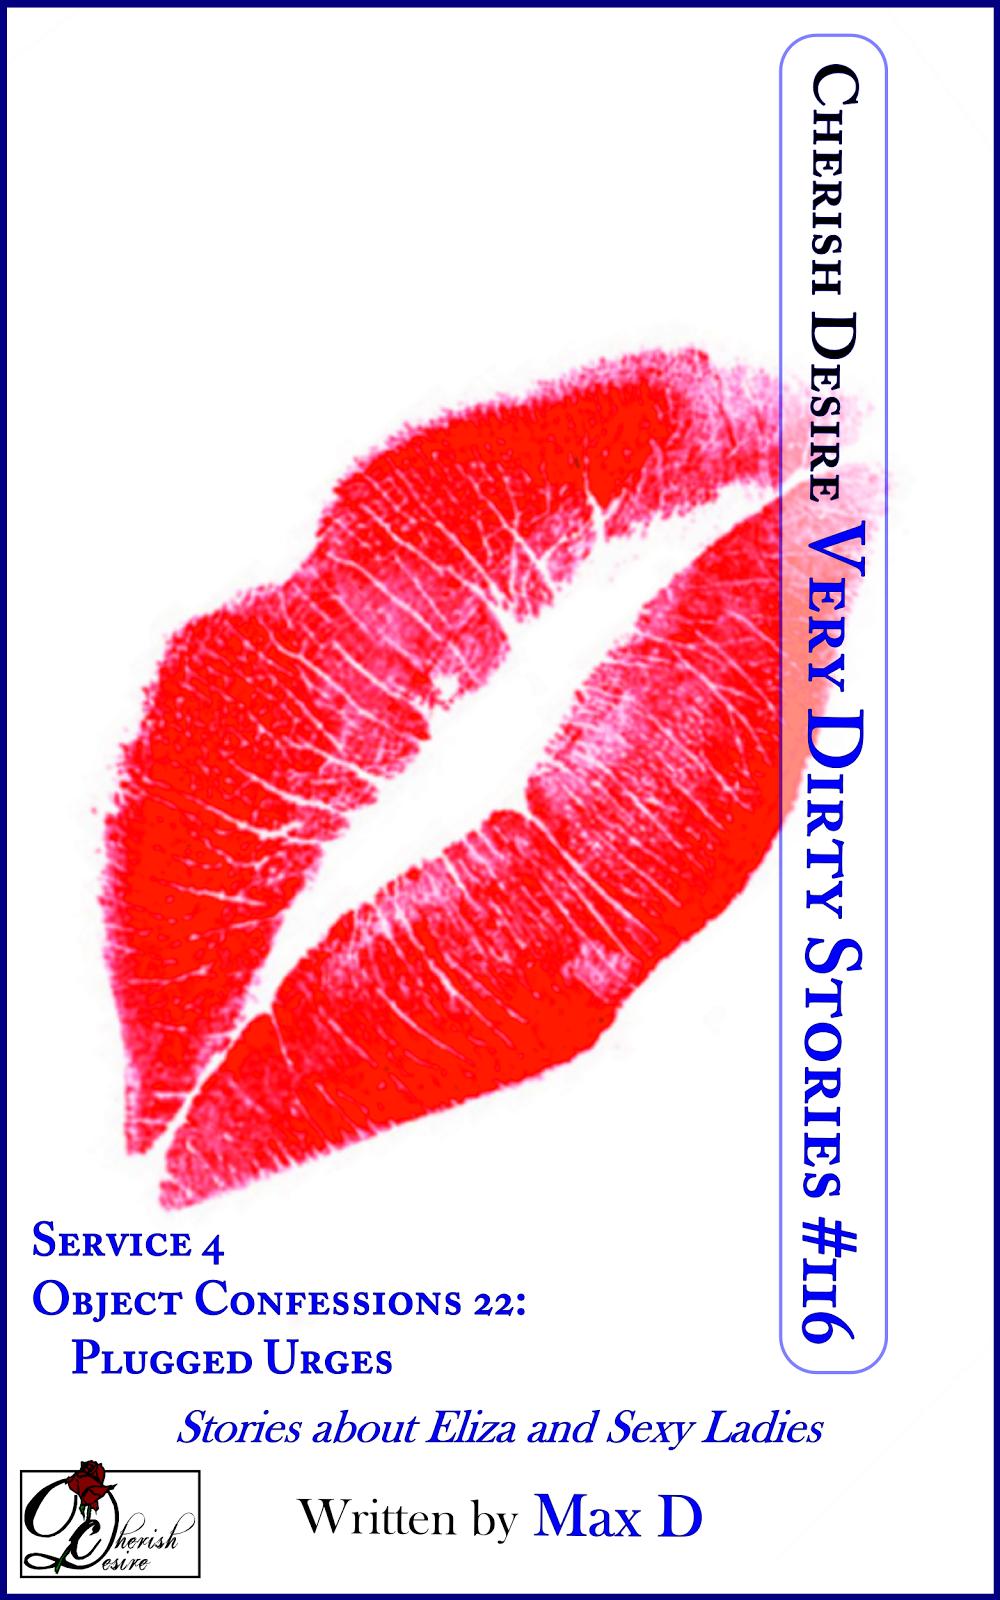 Cherish Desire: Very Dirty Stories #116, Max D, erotica